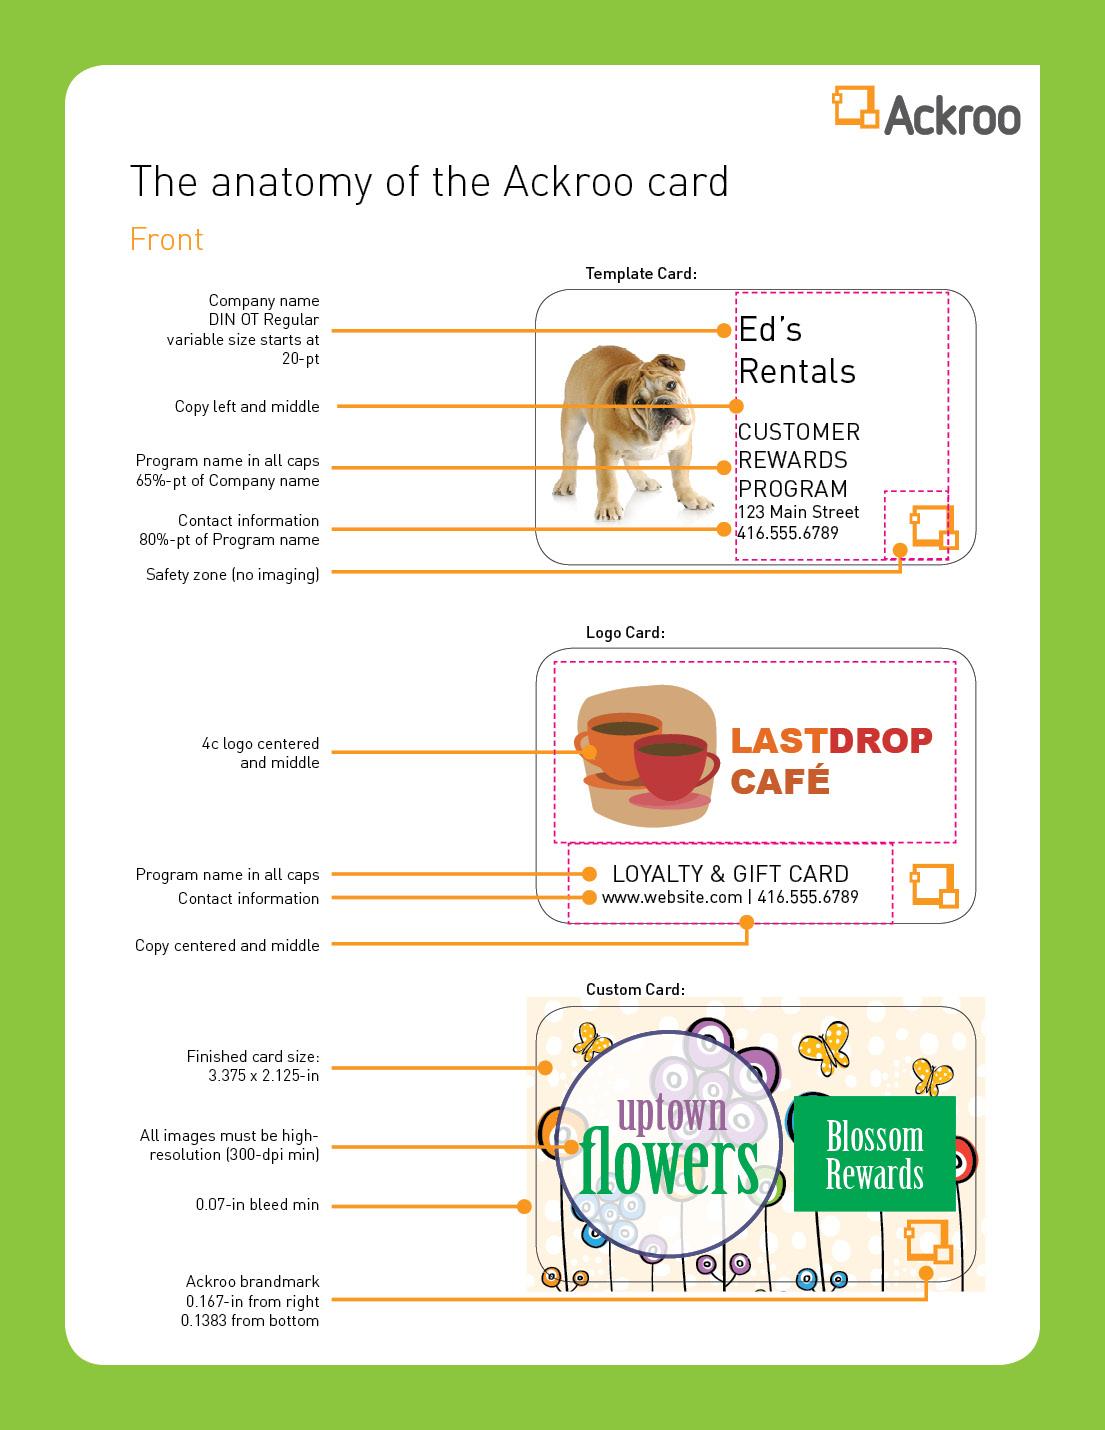 Ackroo Card Anatomy.jpg